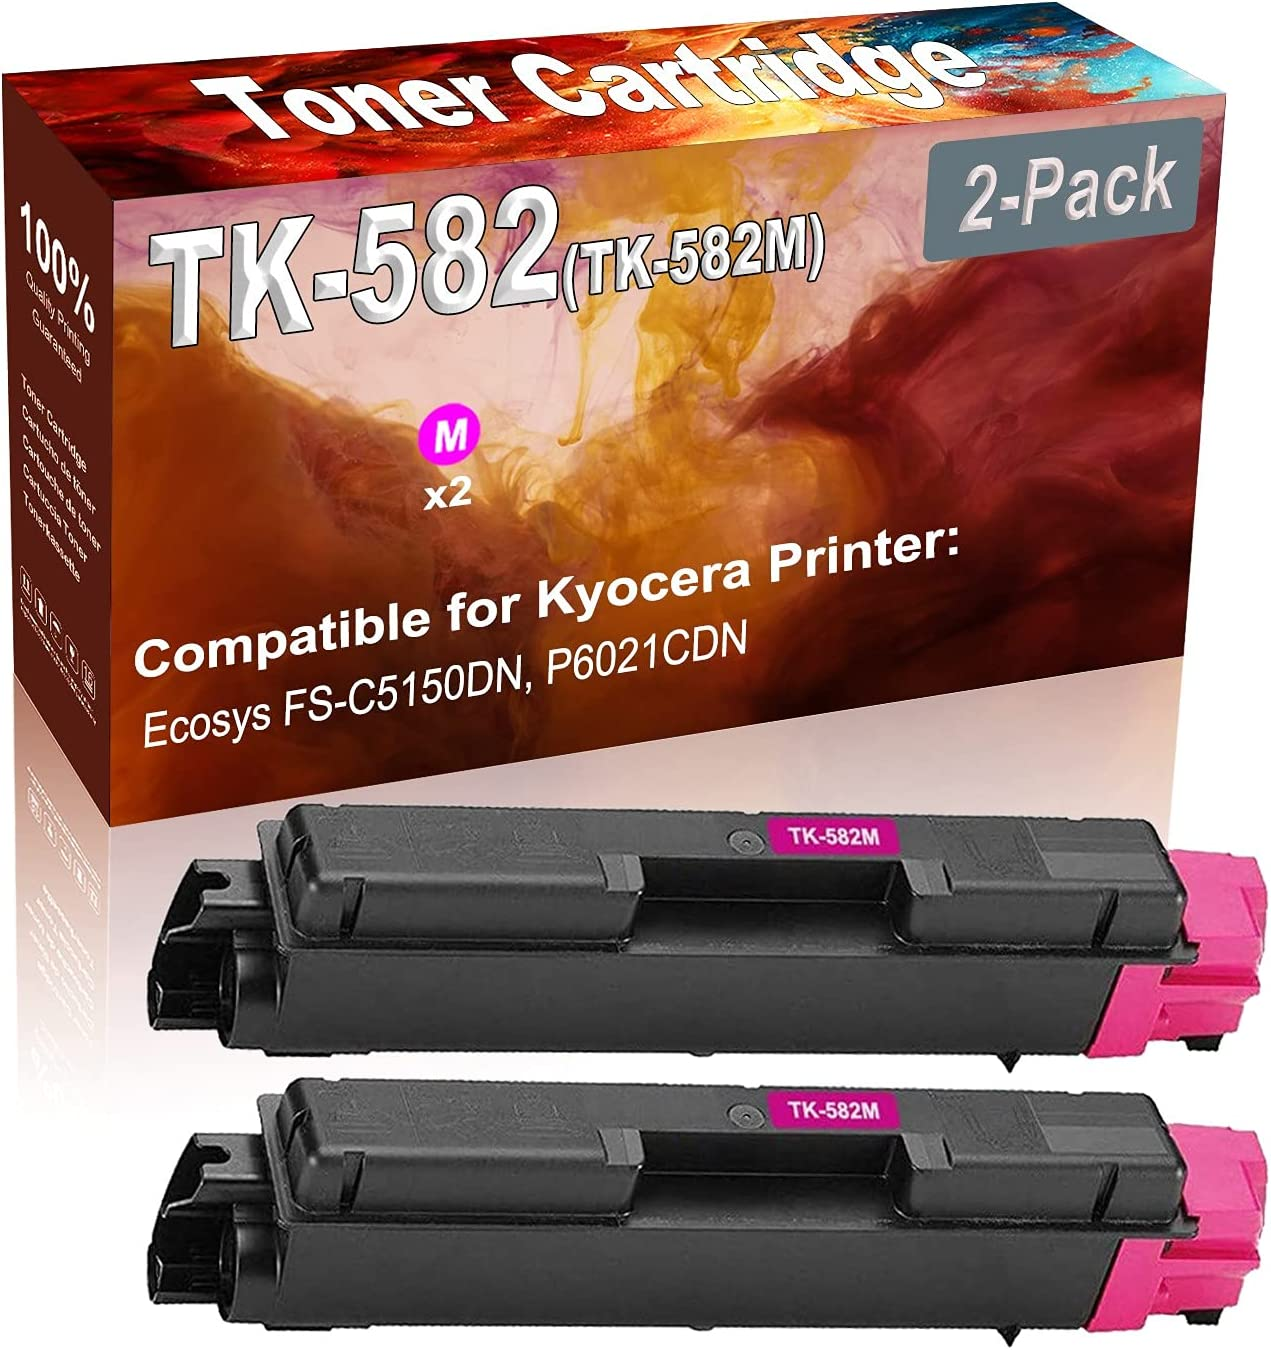 2-Pack (Magenta) Compatible Ecosys FS-C5150DN Laser Toner Cartridge (High Capacity) Replacement for Kyocera TK-582 (TK-582M) Printer Toner Cartridge